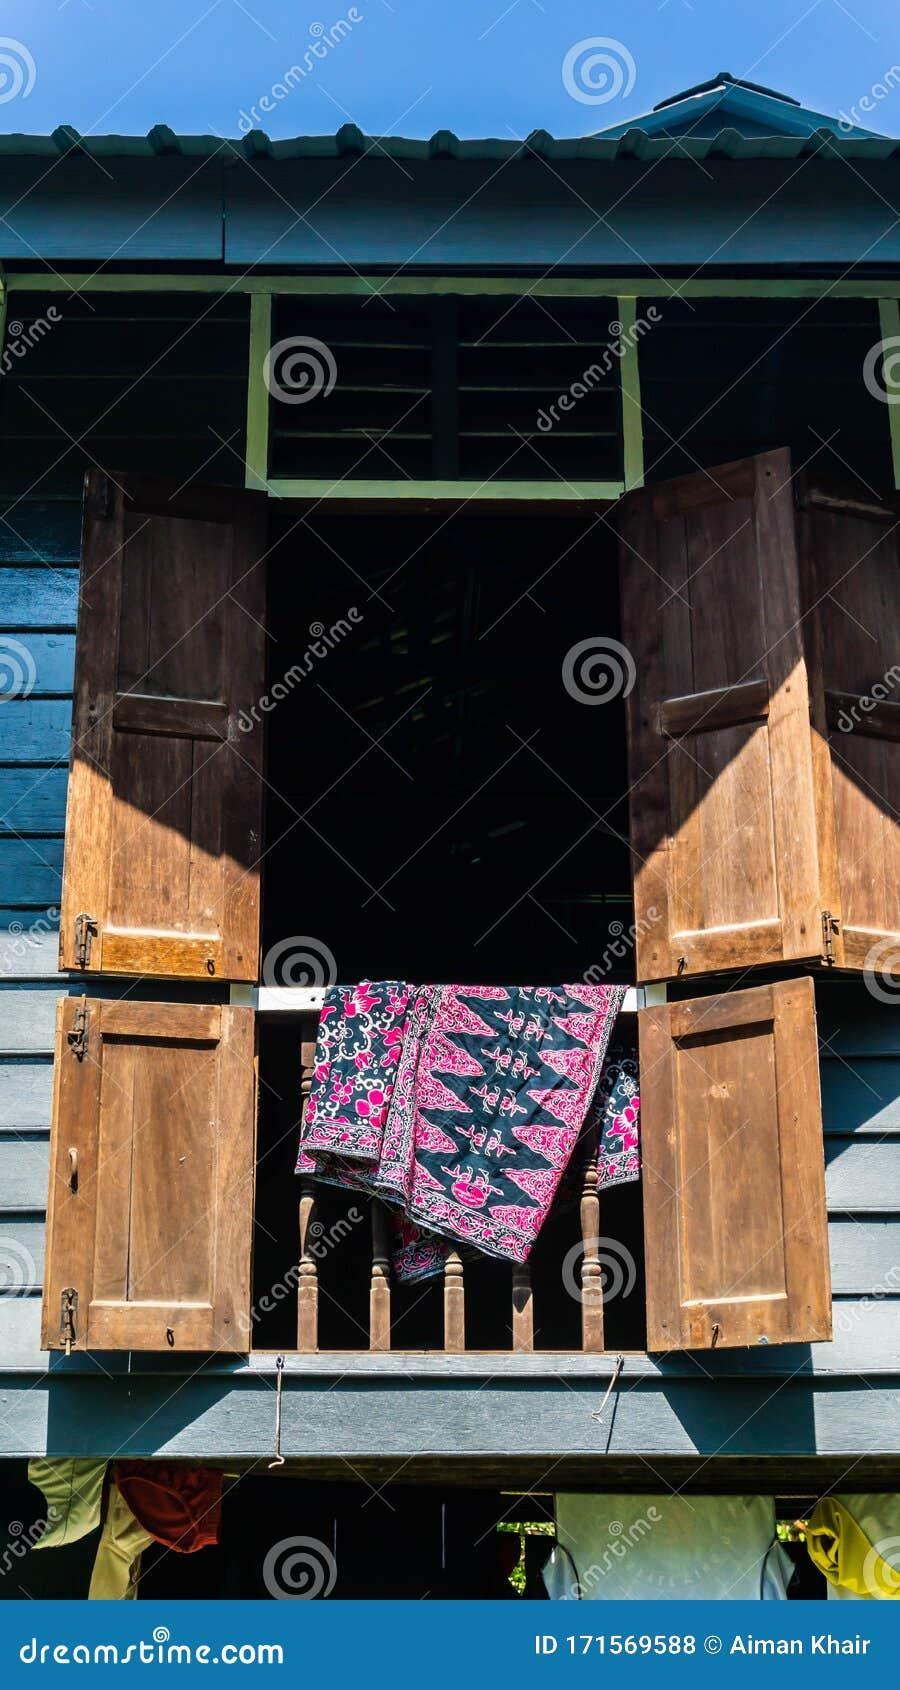 Batik Fabric Hanging On The Window Of Rumah Kampung Under The Bright Sunlight Stock Photo Image Of Classic Blue 171569588